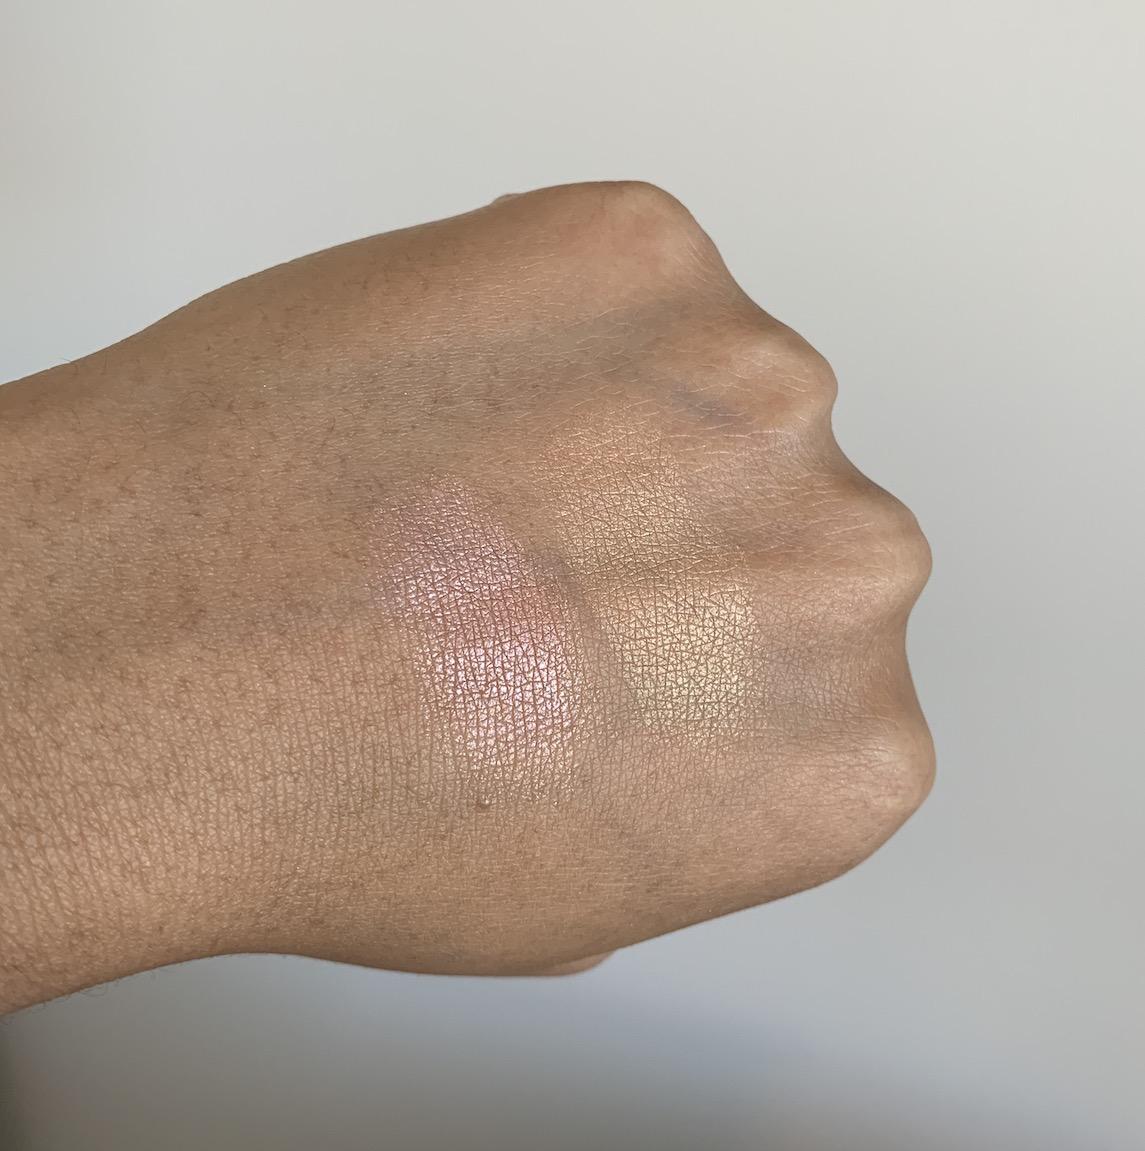 NARS Highlighting Powder in Maldives and Ibiza swatches on dark skin NC45